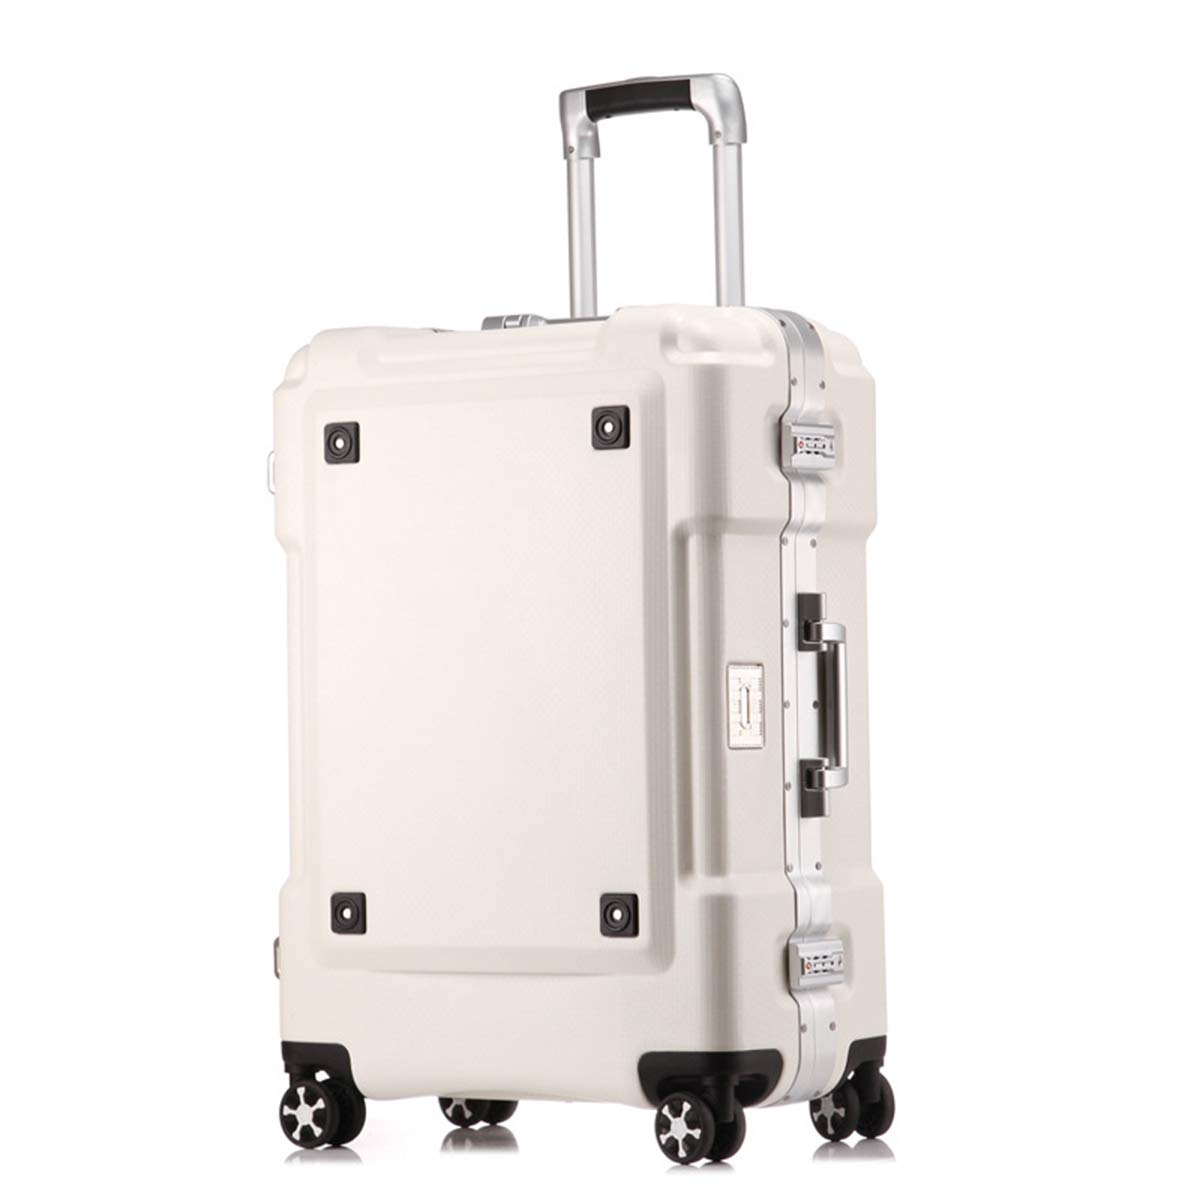 ABS + PC旅行はトロリー小屋で運びます、軽量の堅い貝360°の紡績車の車輪旅行握りましたチェックイン荷物スーツケース,white,29inch 29inch white B07QQR195B